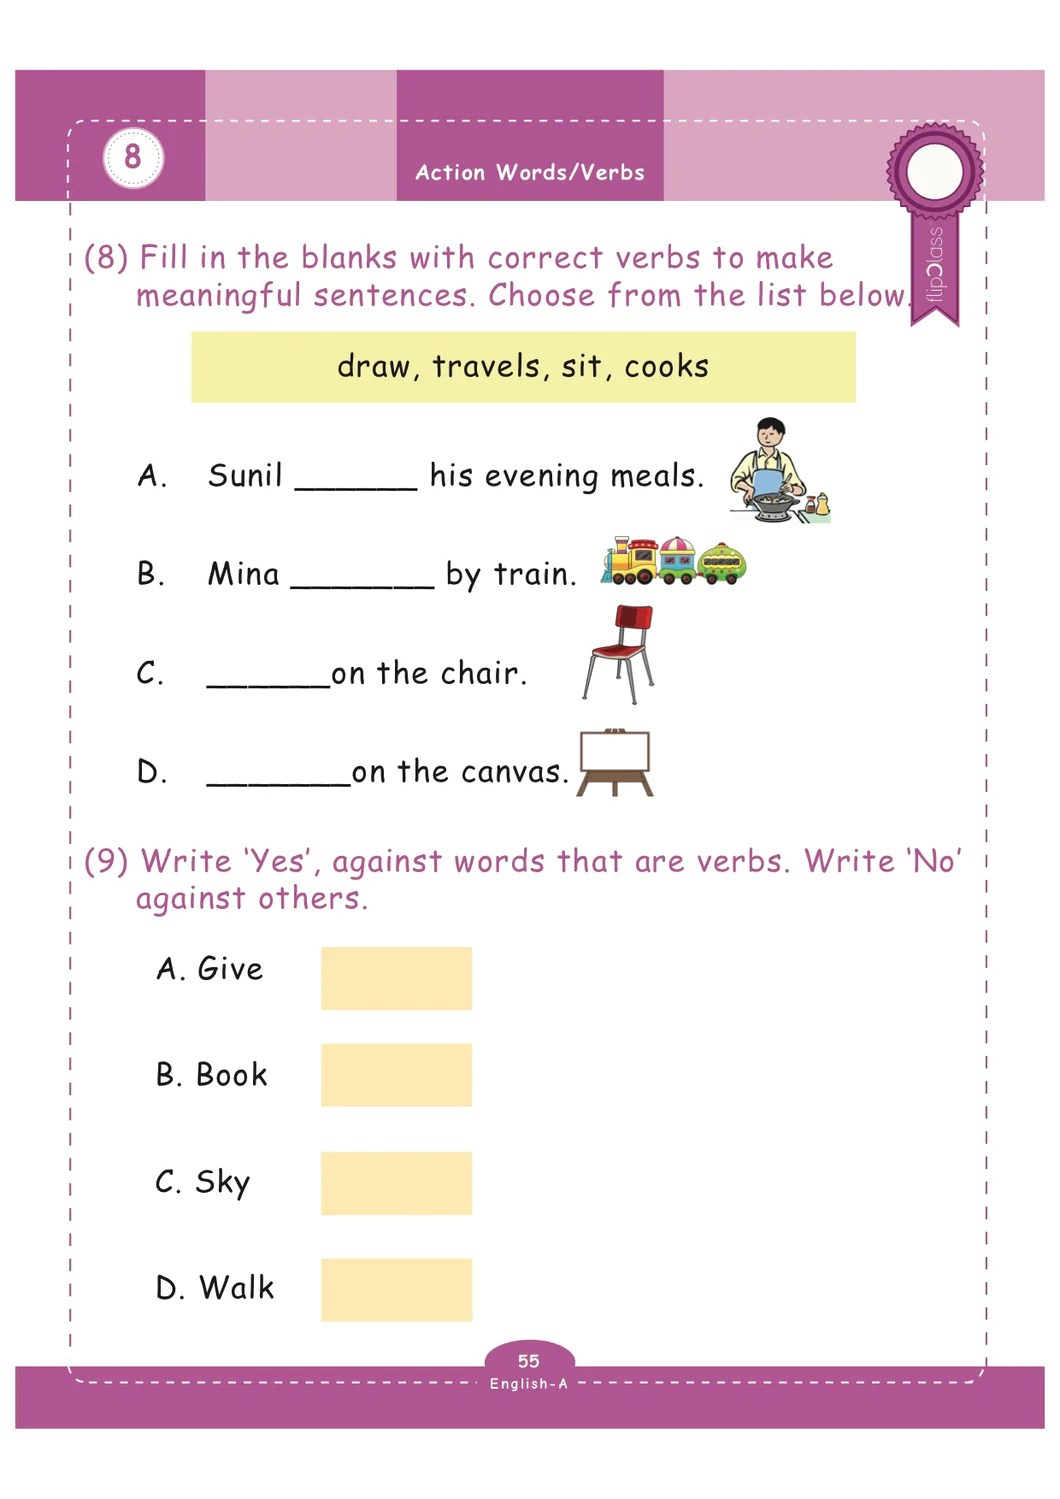 medium resolution of 29 English Worksheet For Grade 1 - Worksheet Resource Plans